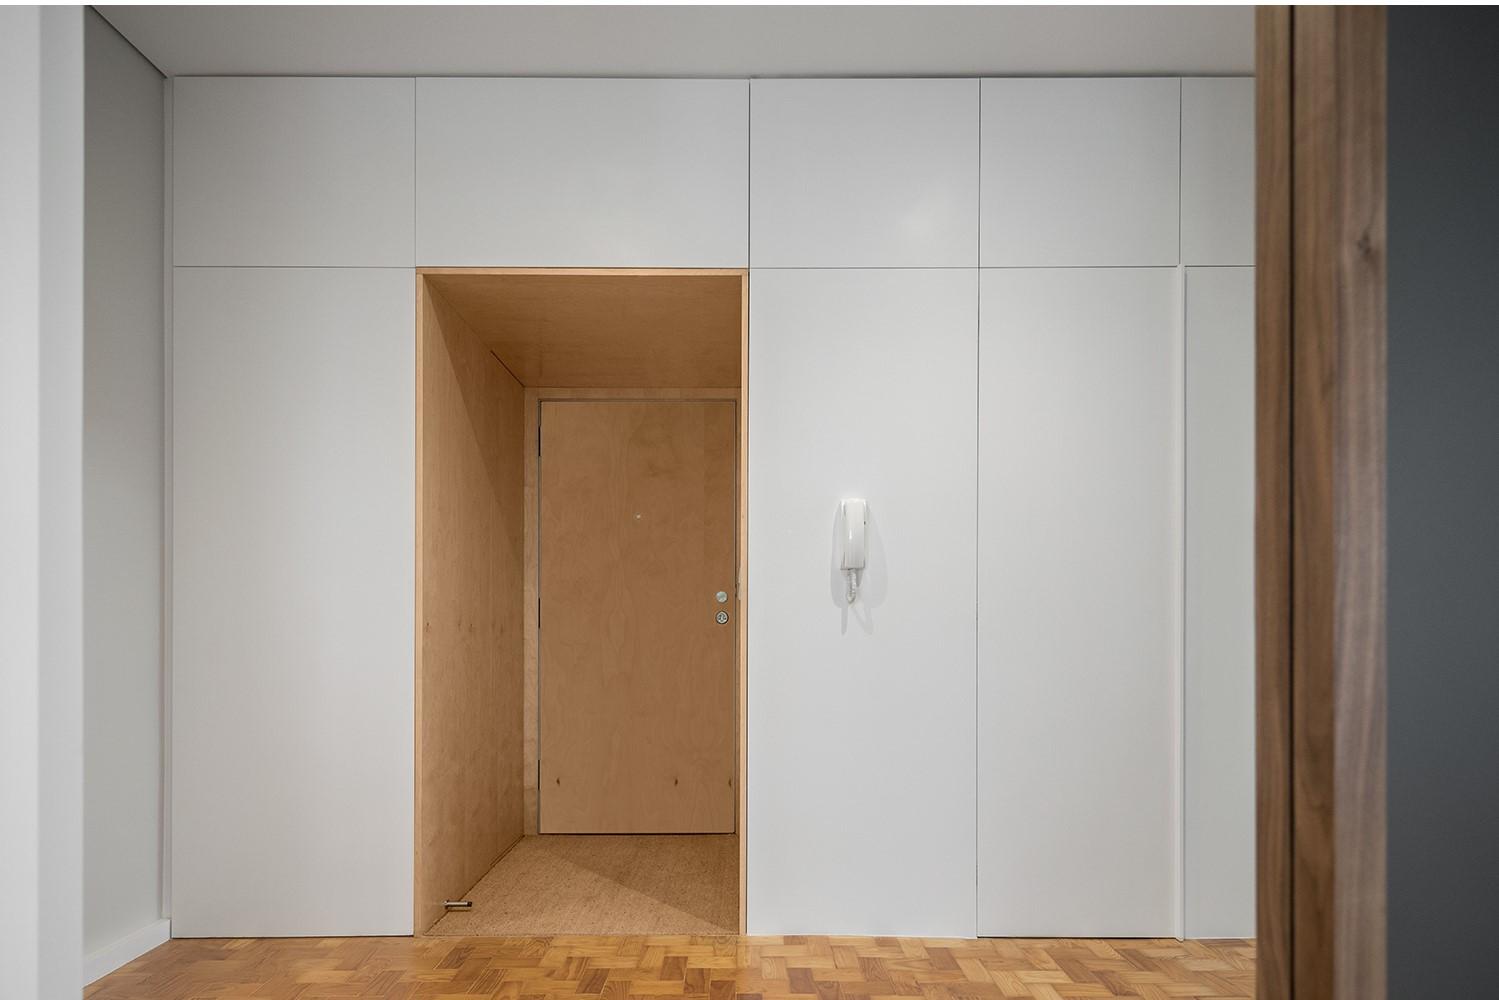 Reportagem Fotografia de arquitectura portuguesa fotografo Ivo tavares studio - (nome do projecto) de (arquitecto).